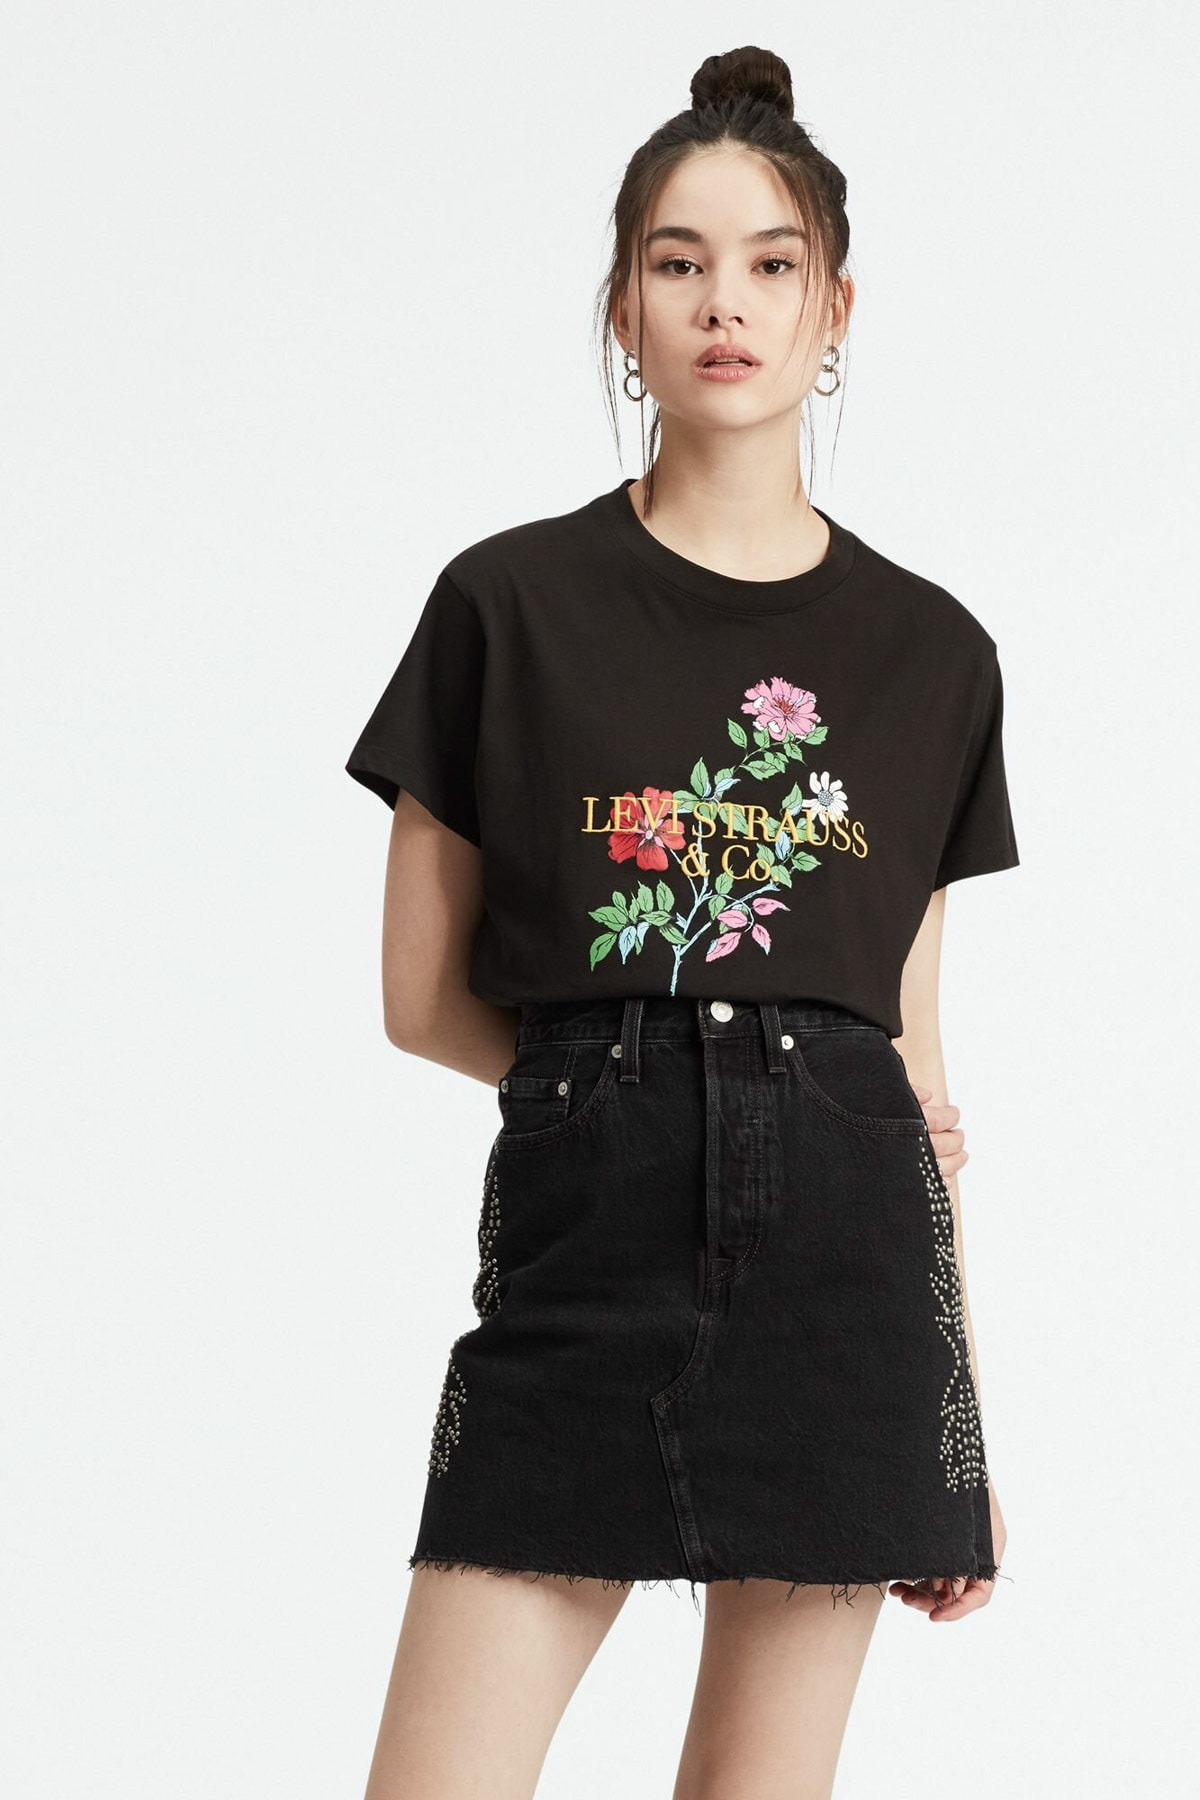 Levi's Kadın T-shirt 69973-0052 -1 1